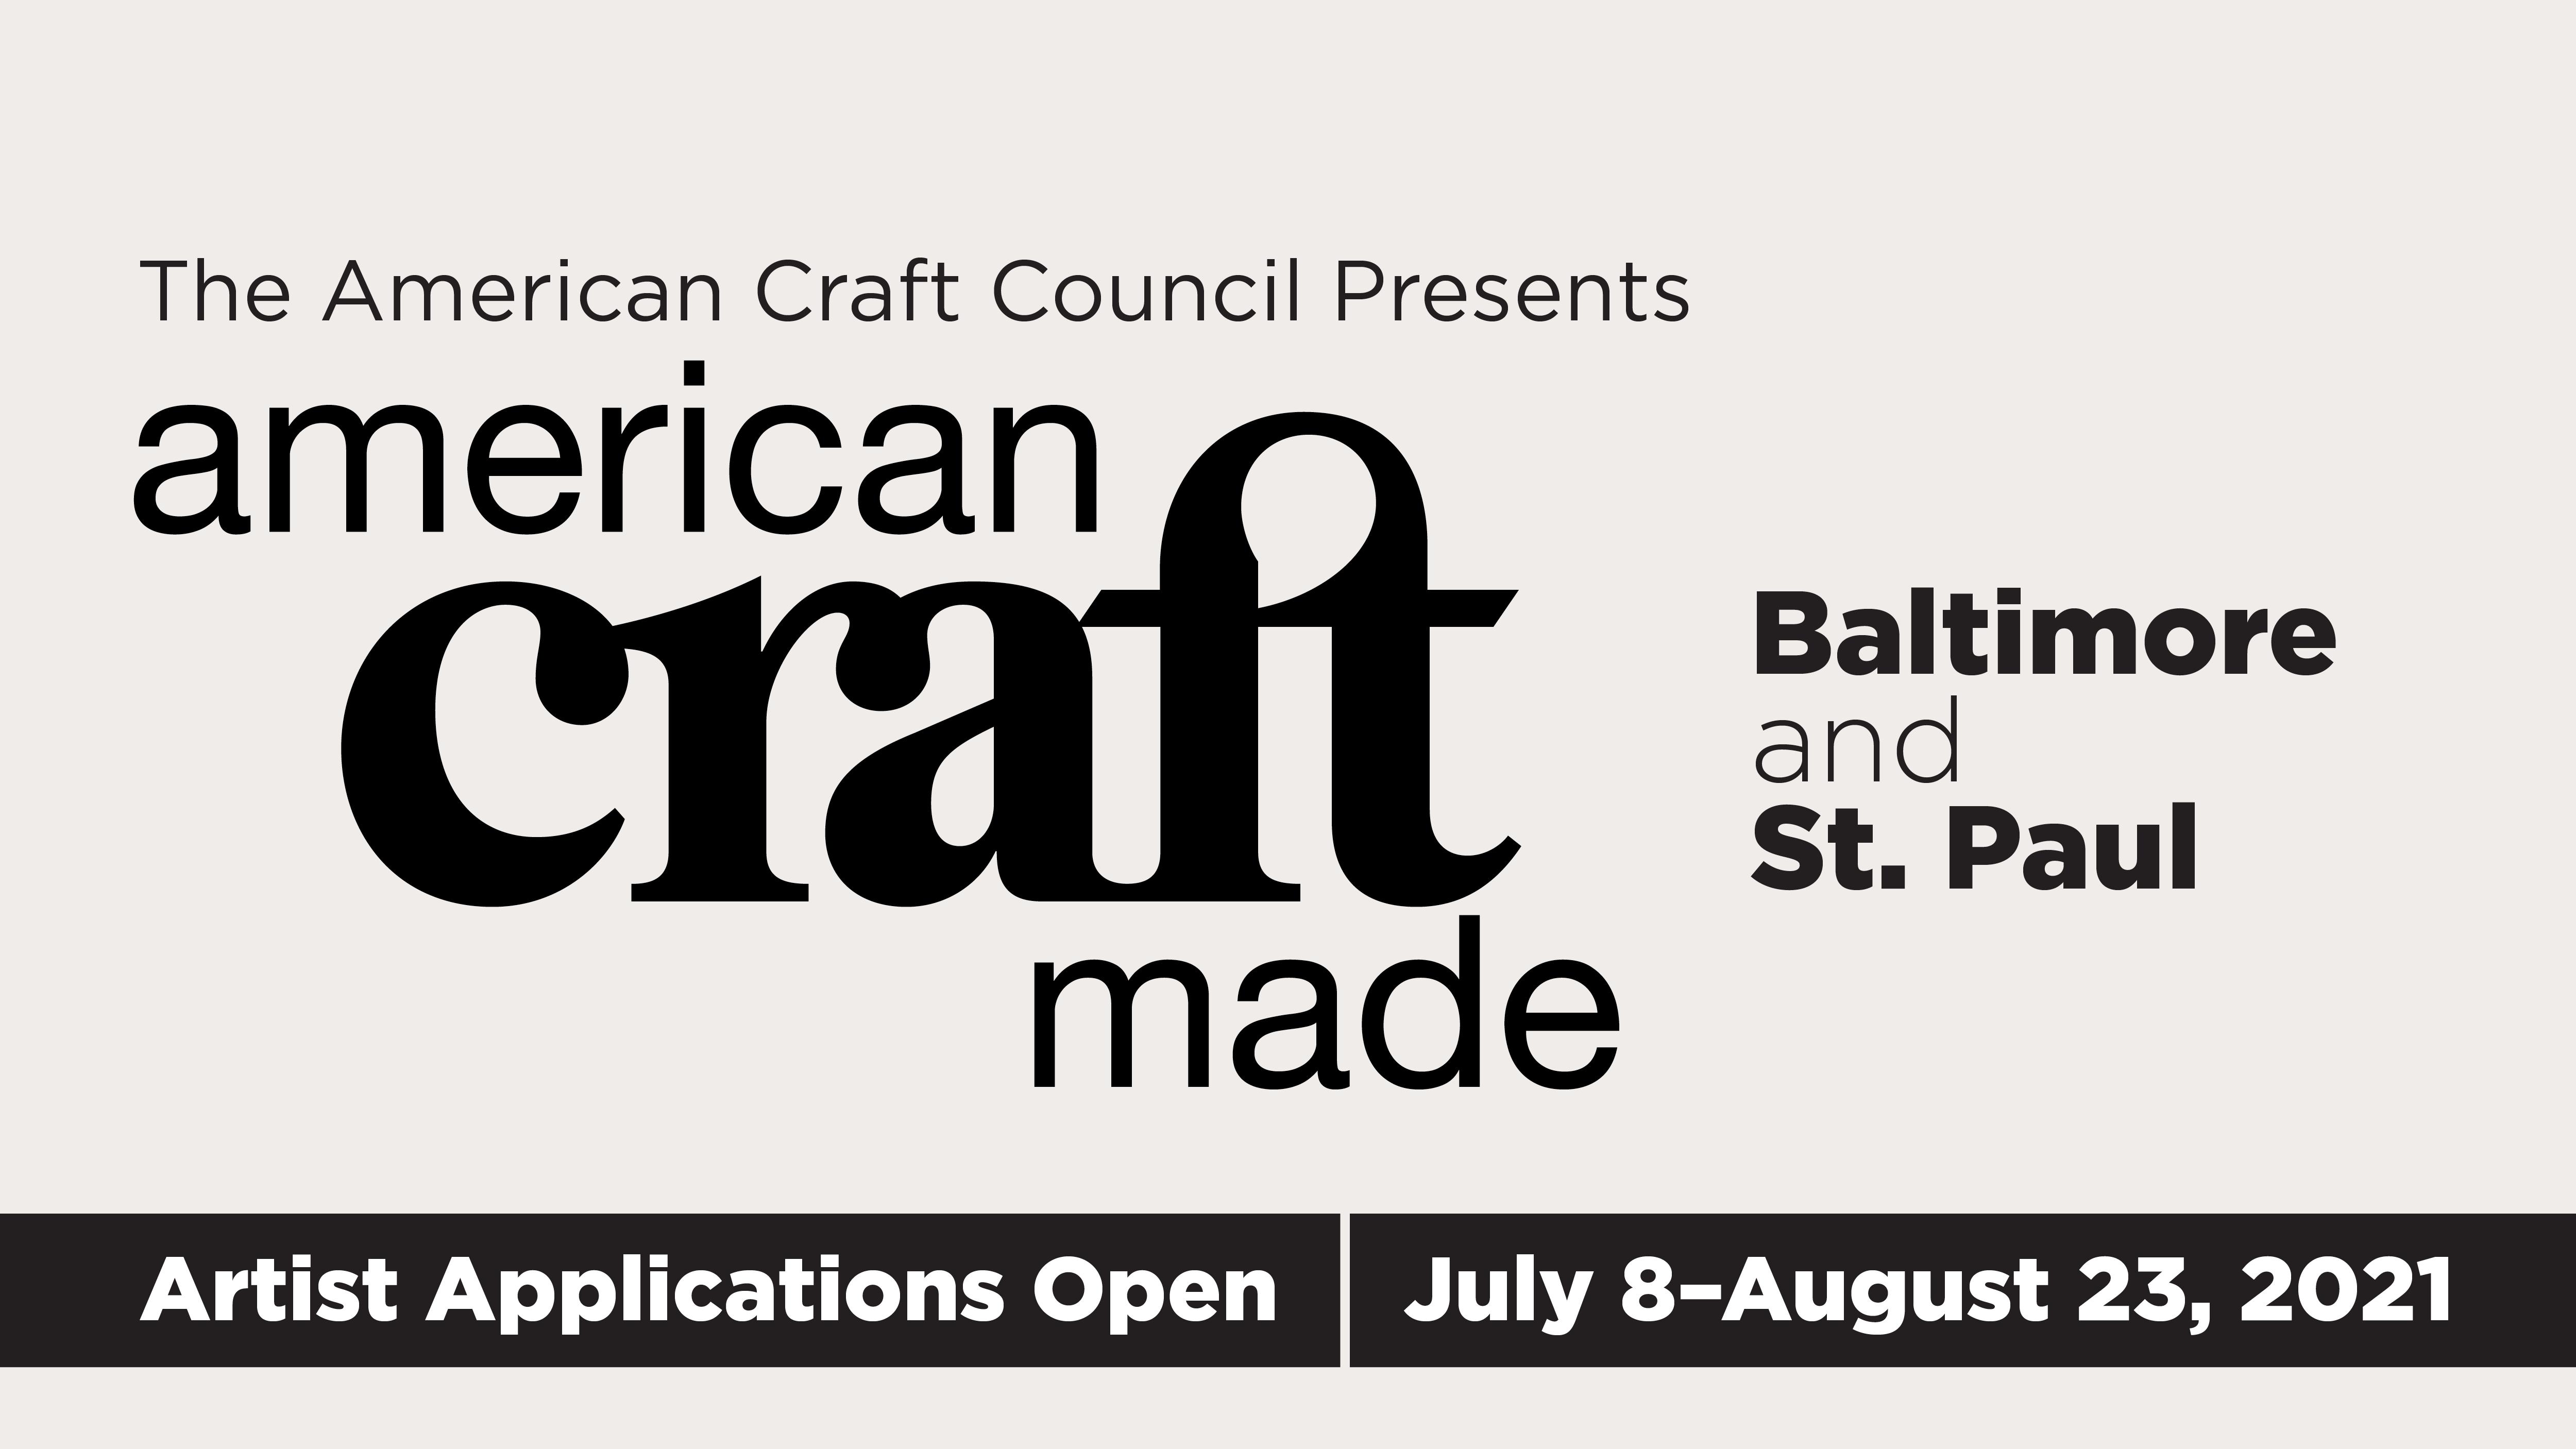 American Craft Council Presents Atlanta Southeast Craft Week Online September 20–26 2021